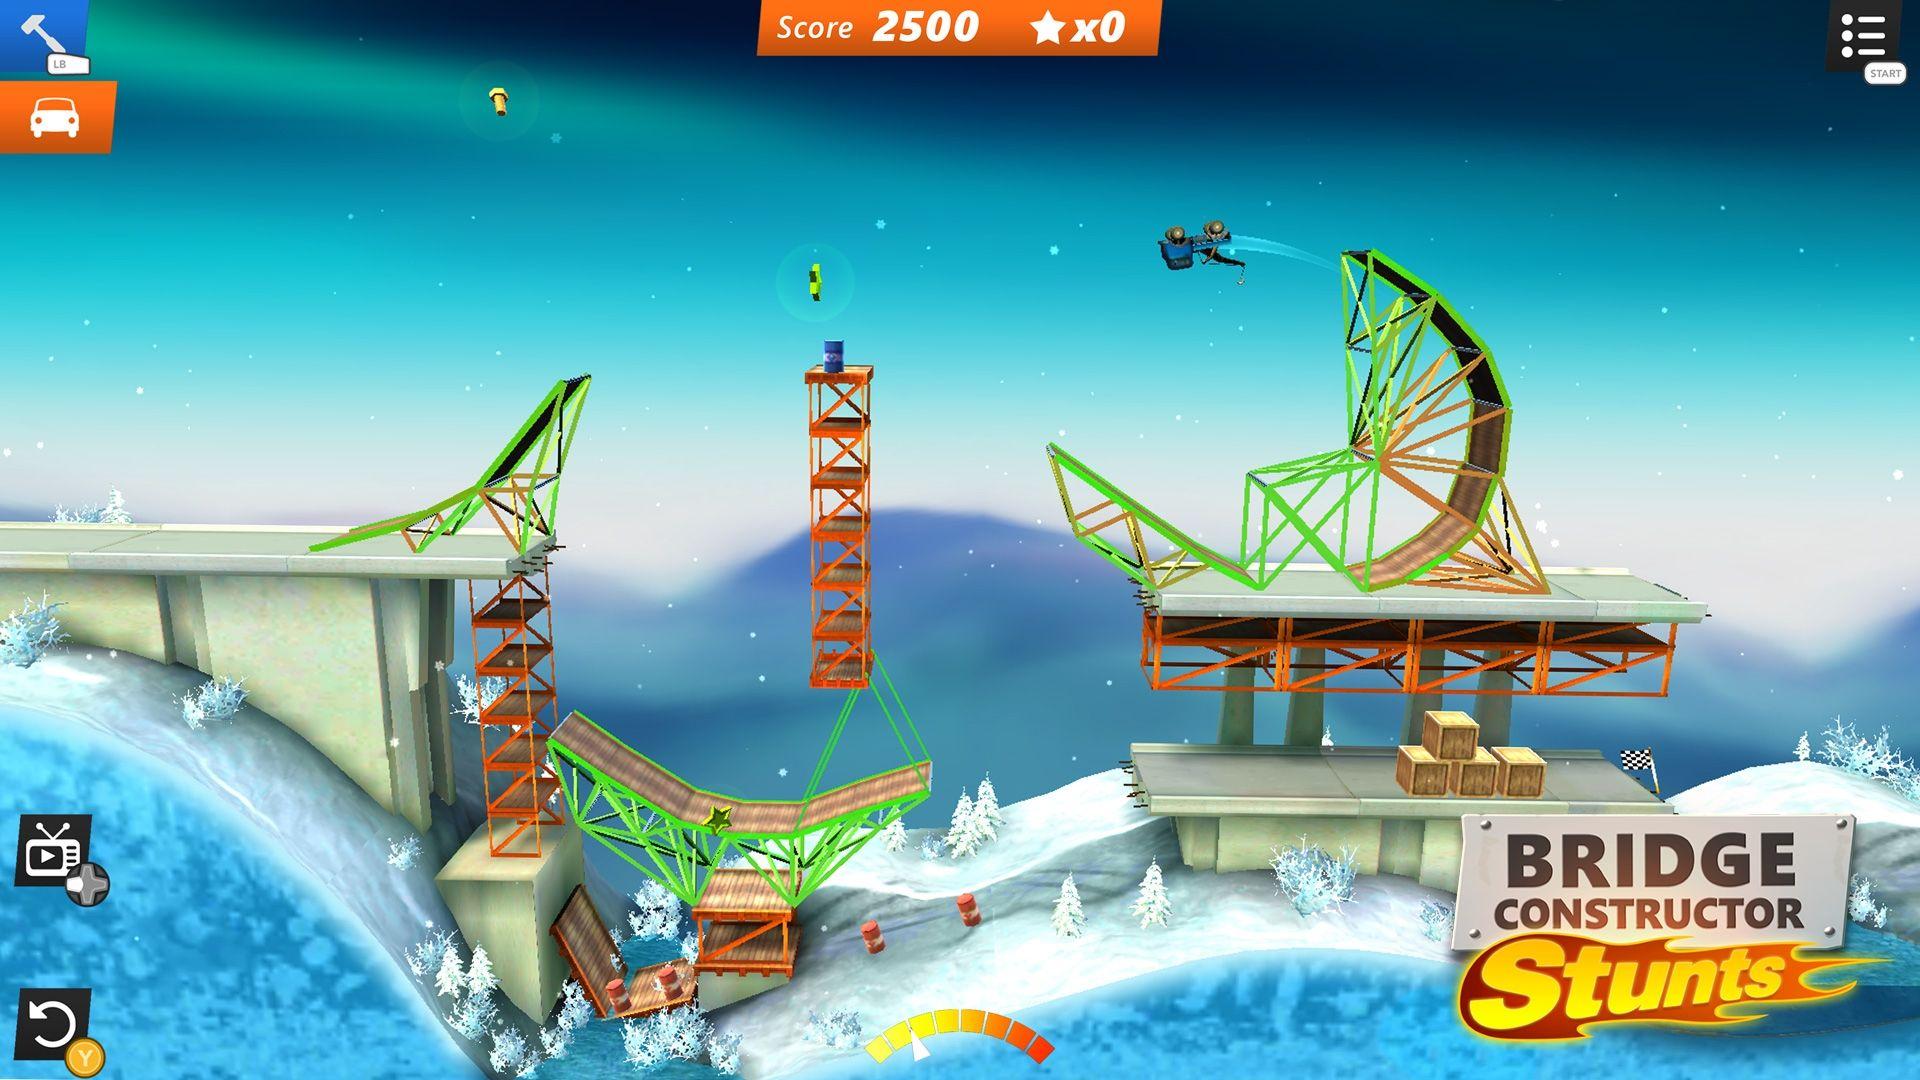 Bridge constructor stunts xbox one release date announced